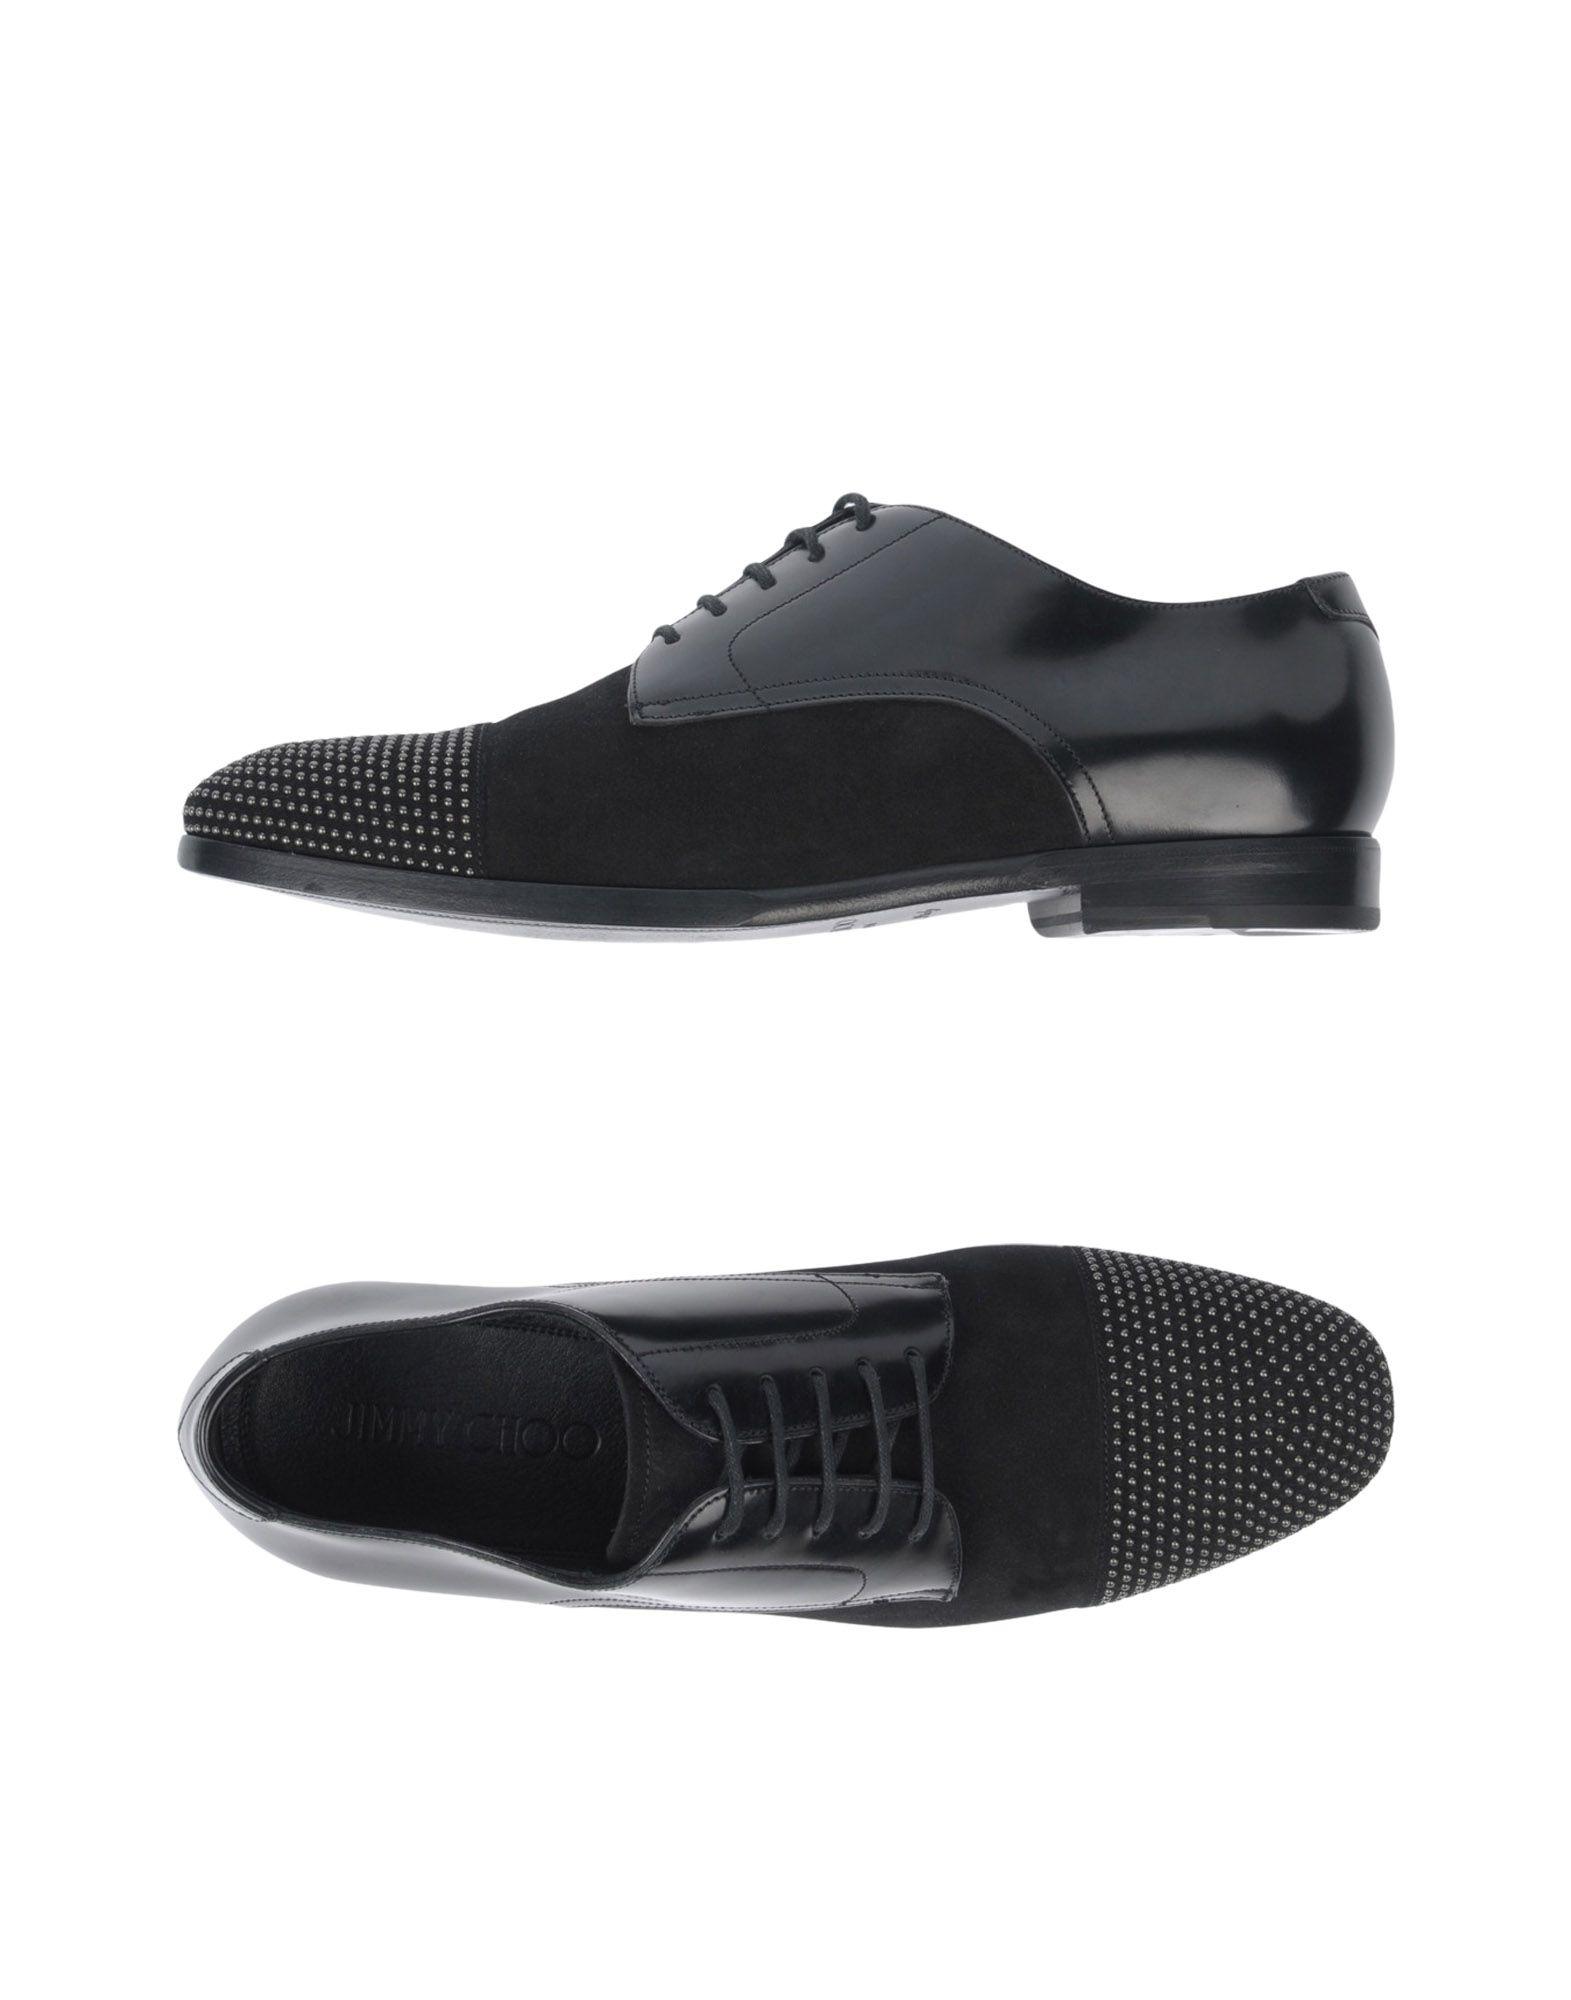 Jimmy Choo Schnürschuhe Herren  11505834FS Gute Qualität beliebte Schuhe